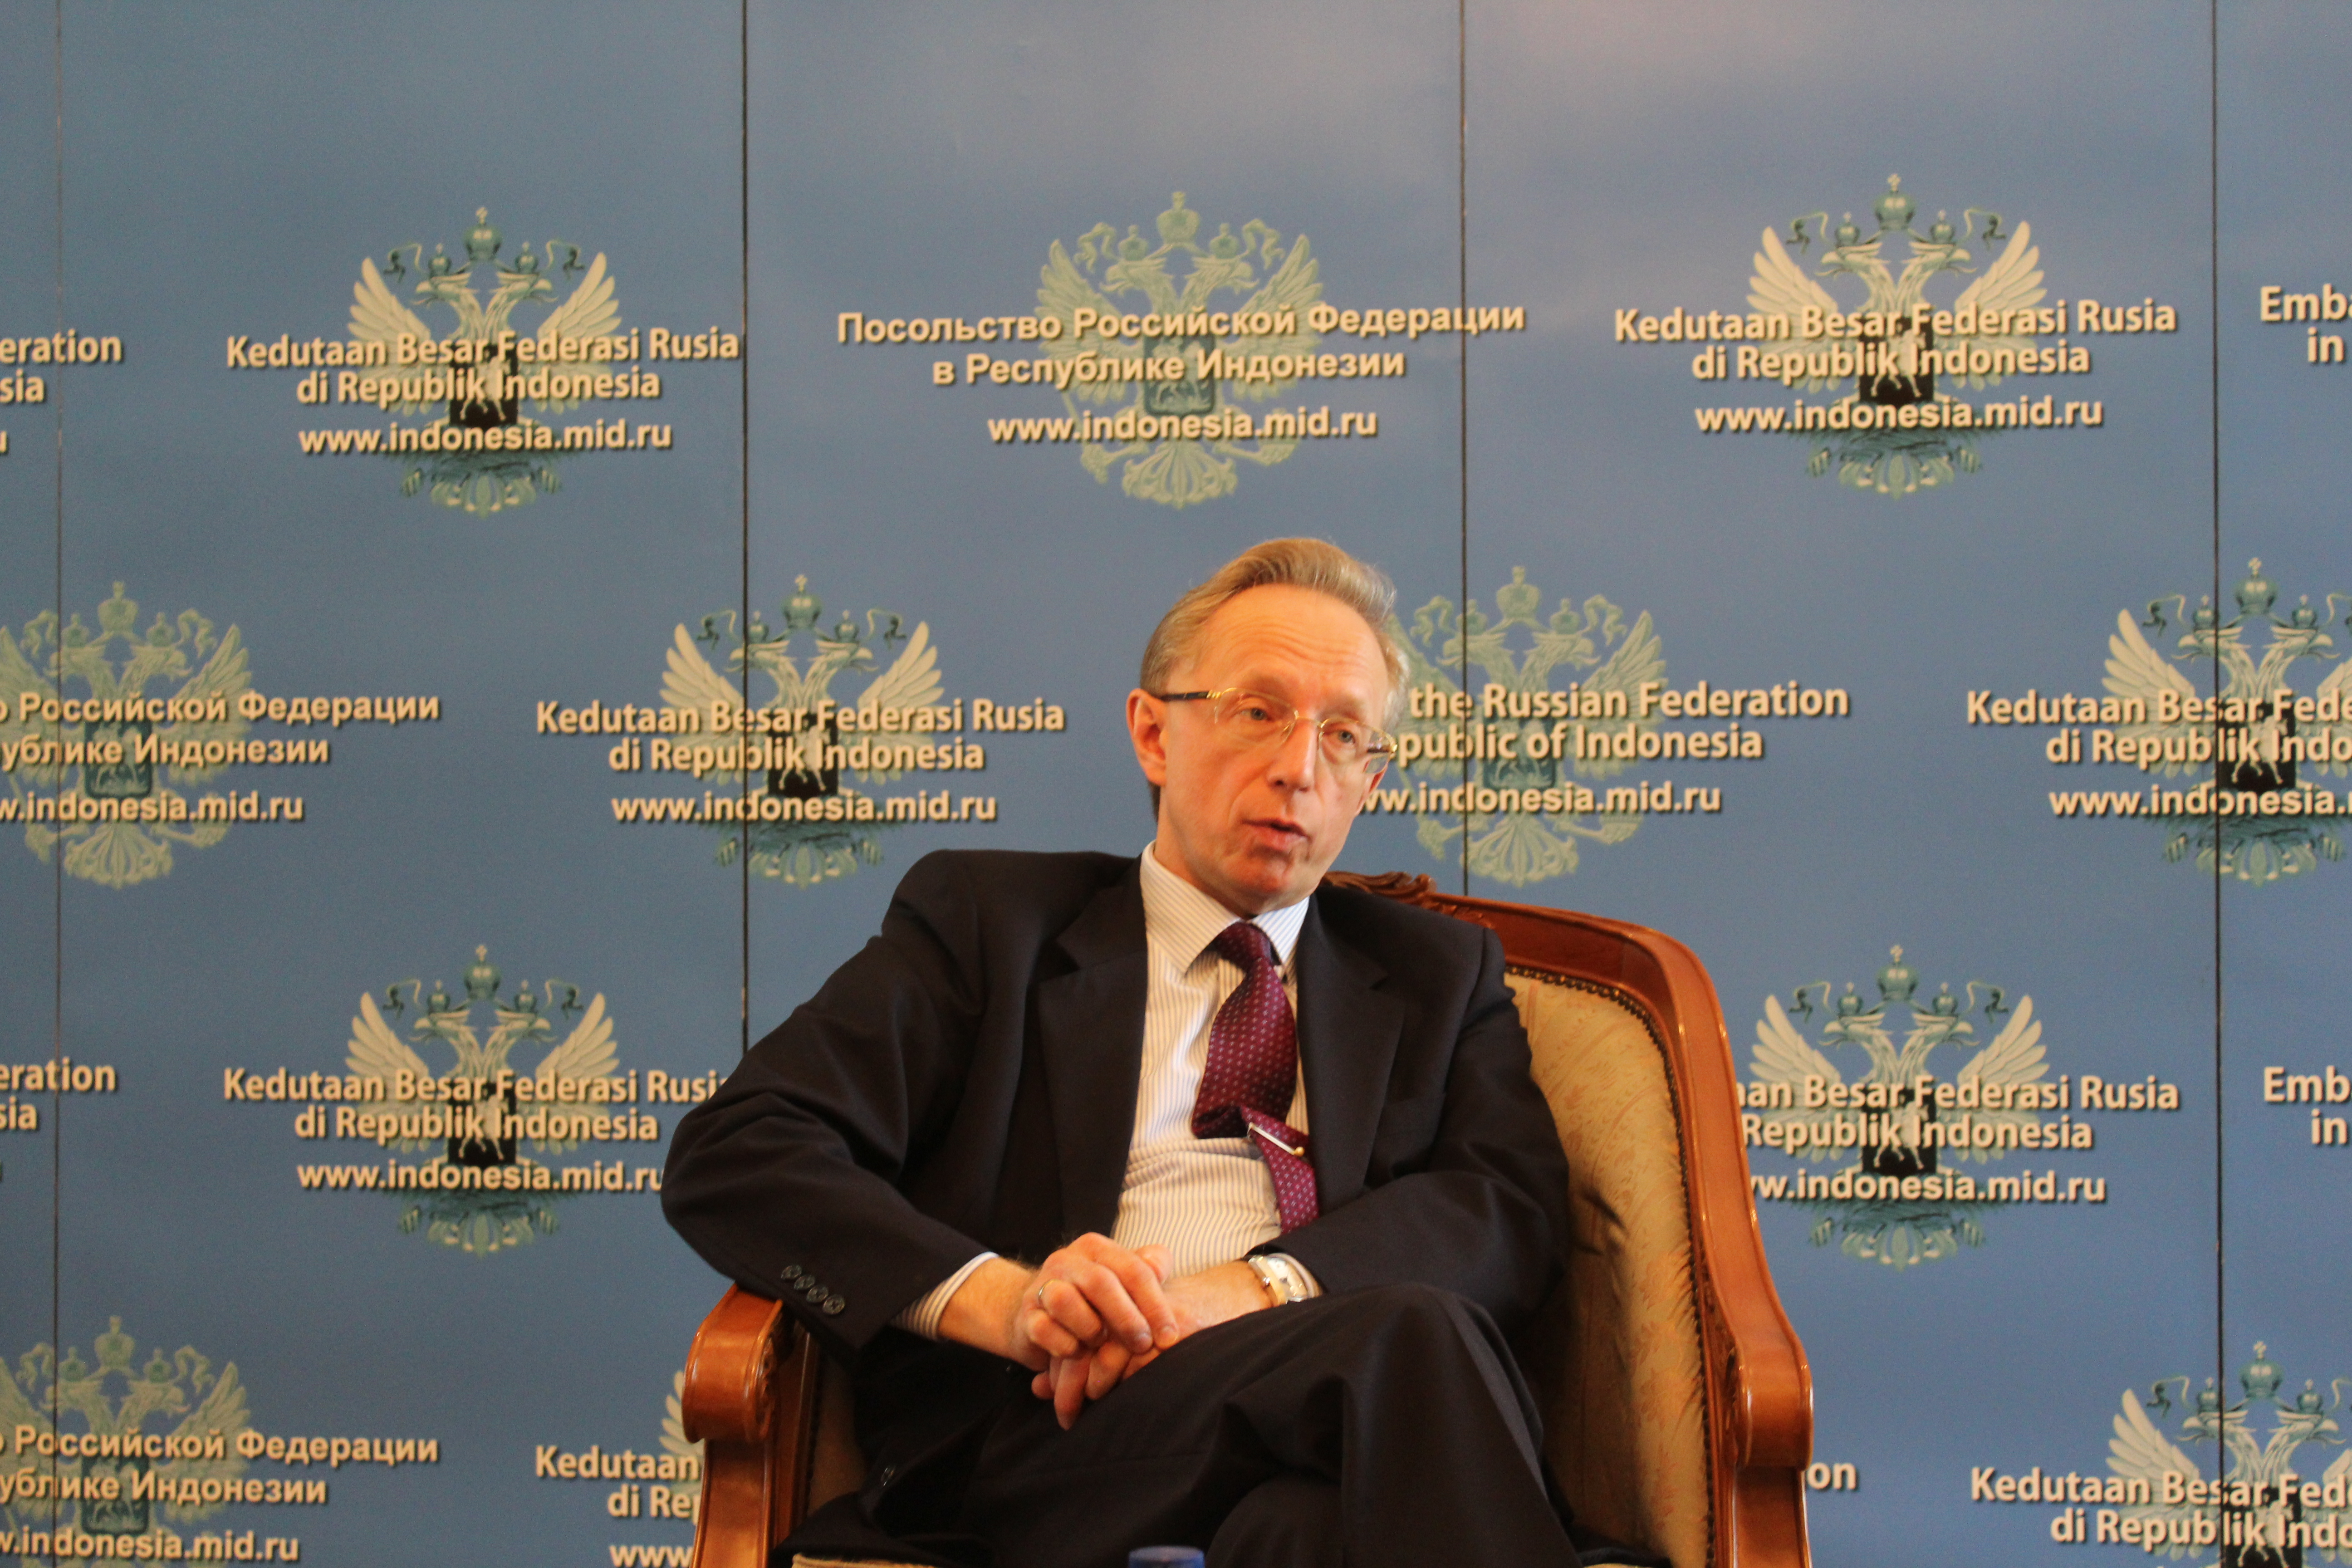 Duta Besar Federasi Rusia untuk Republik Indonesia Mikhail Galuzin.